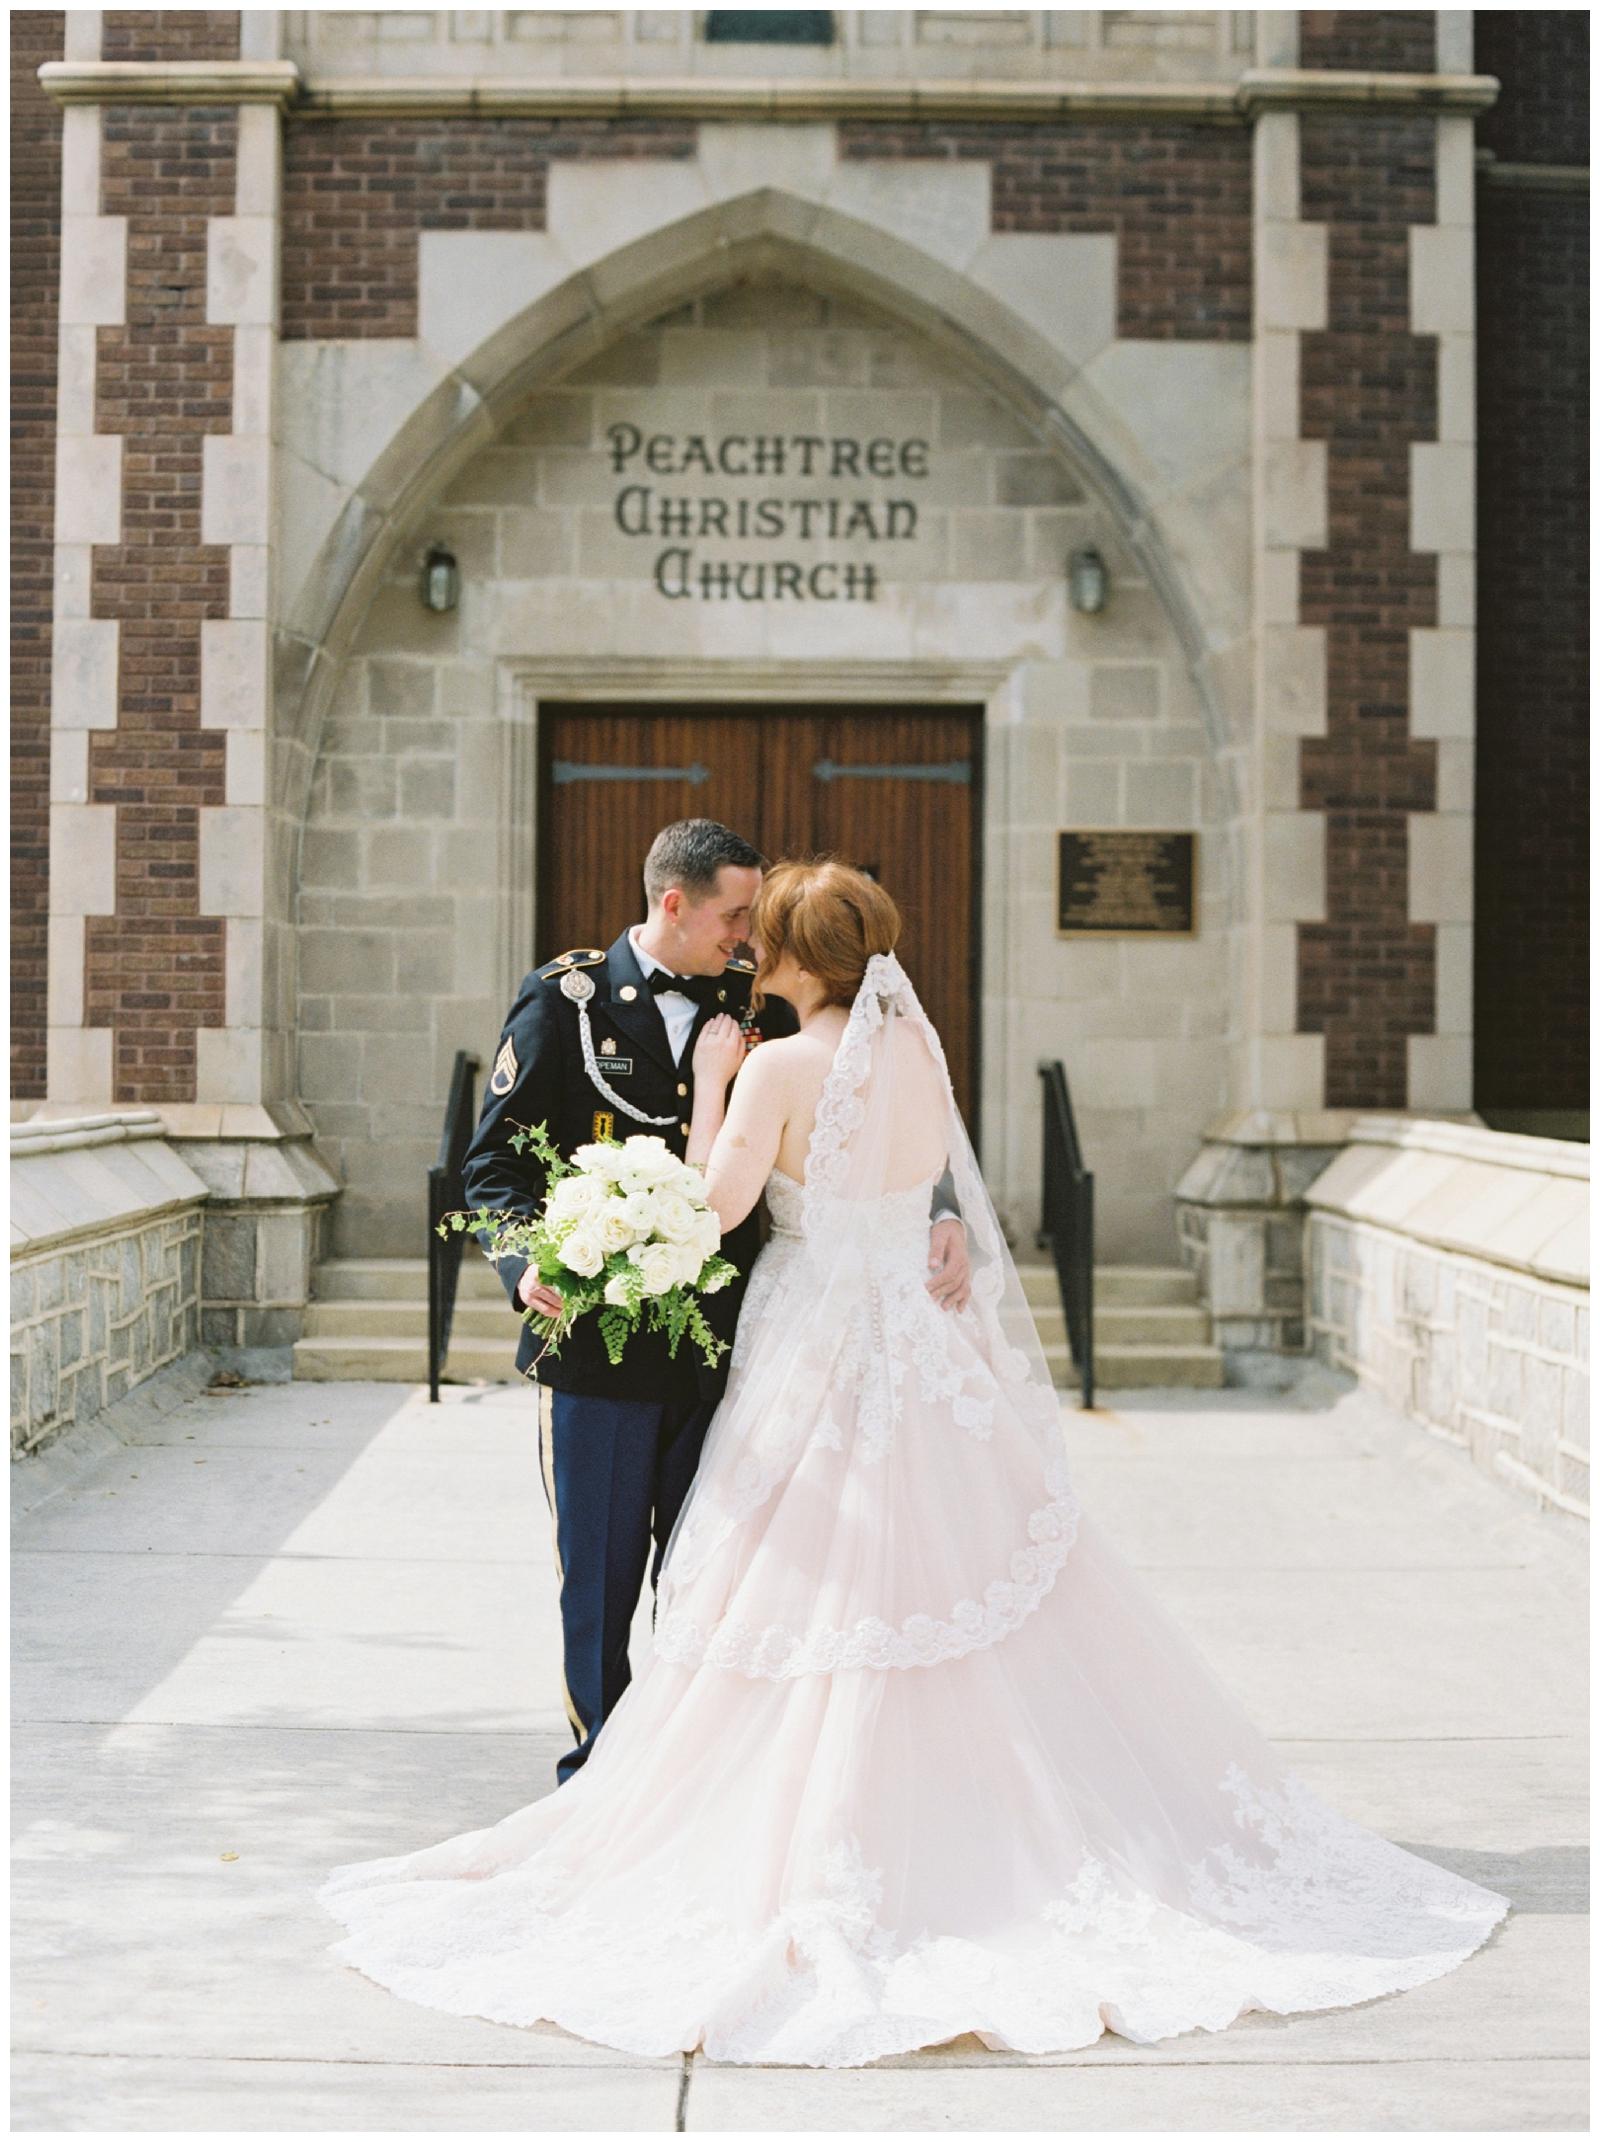 Zola-Austin-Atlanta-Peachtree-Christian-Church-Chastain-Horse-Park-Wedding-0030.jpg